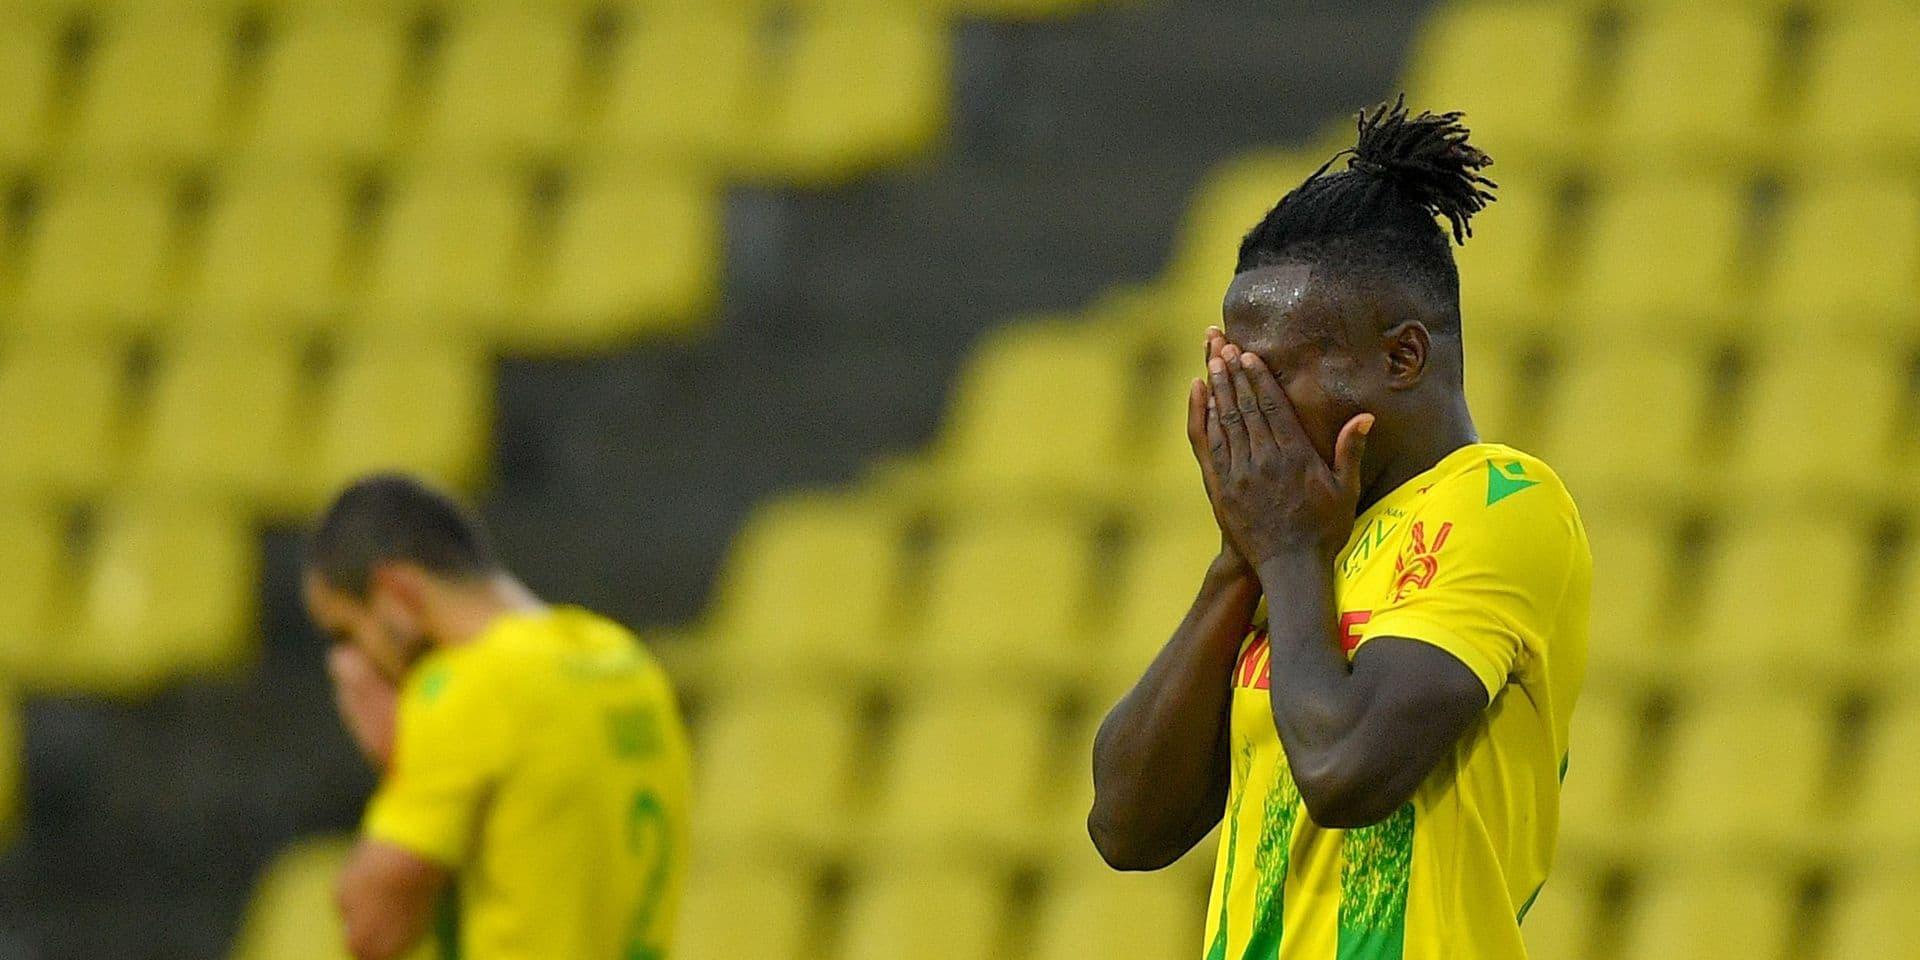 Un club de Ligue 1 mis en vente sur leboncoin.fr